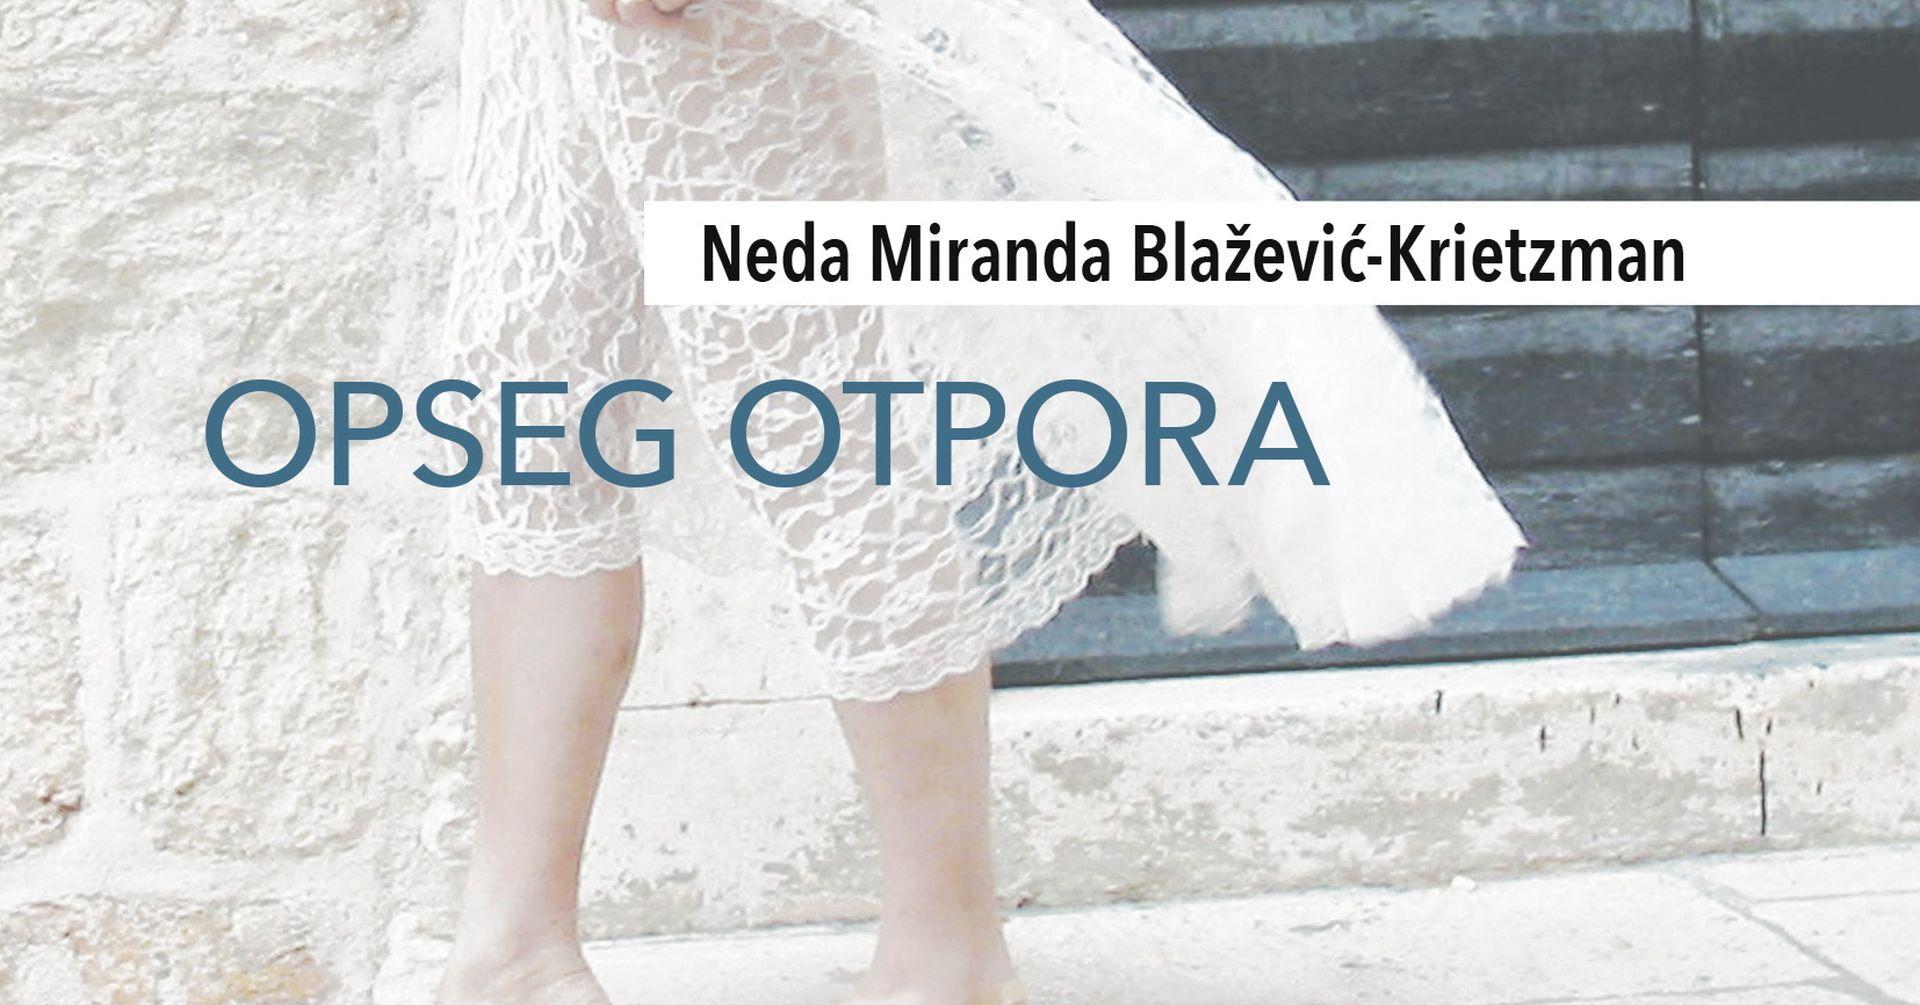 ZBF Predstavljena autobiografija Nede Mirande Blažević-Krietzman